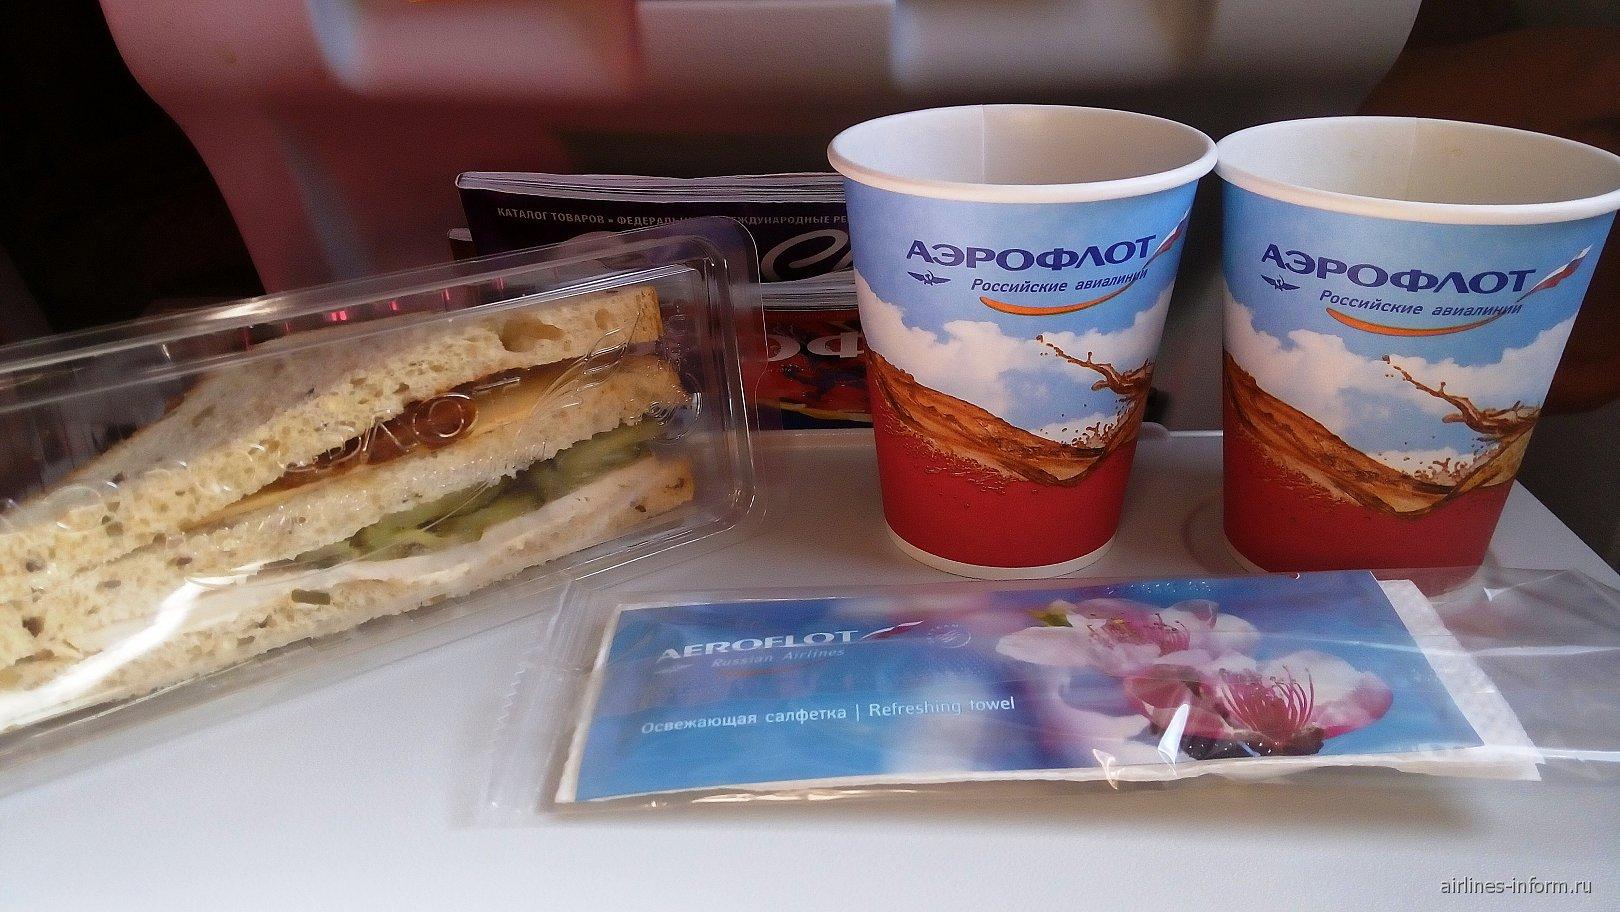 Бортпитание на рейсе Аэрофлота Москва-Екатеринбург